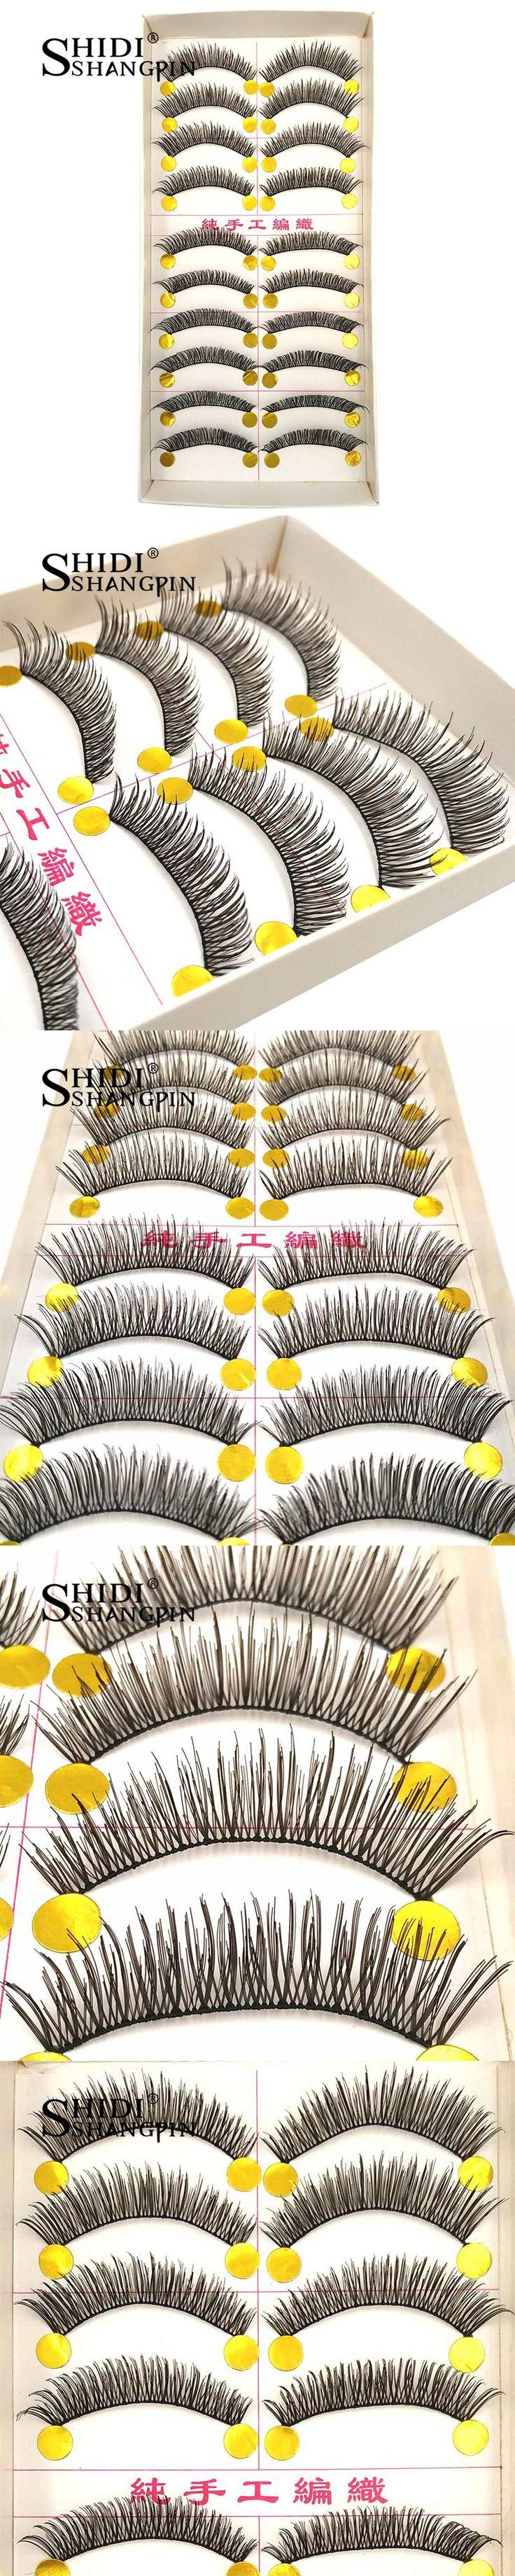 10 Pairs False Eyelashes Extension Eyelash Make Up Beauty Bare Lash Extension Kit Wispy Long Eyelashes Natural Makeup Fake Lahes